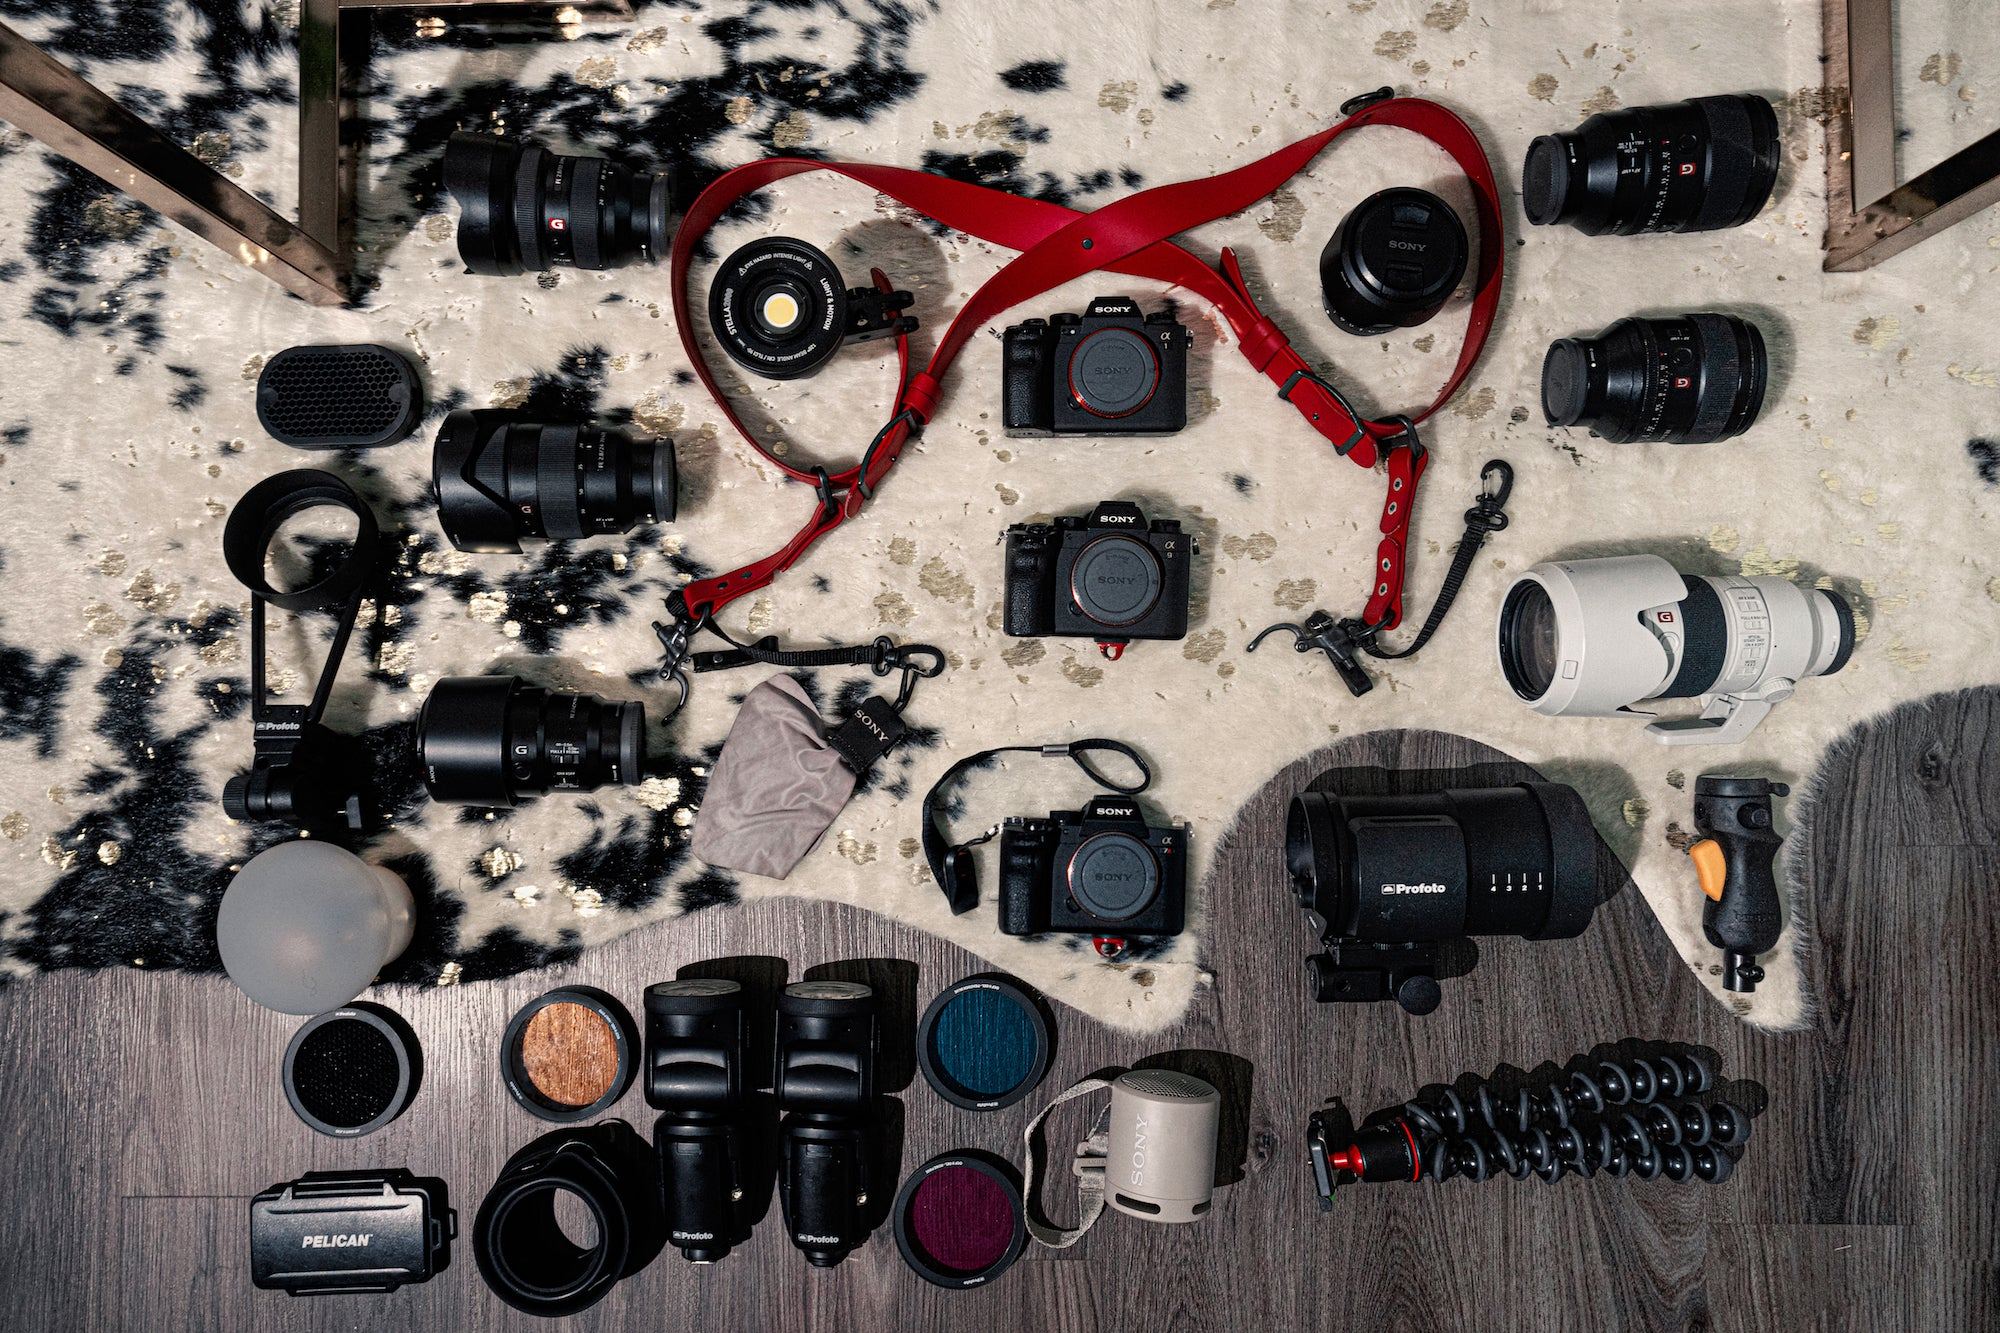 Kesha Lambert's gear for capturing weddings, portraits and more